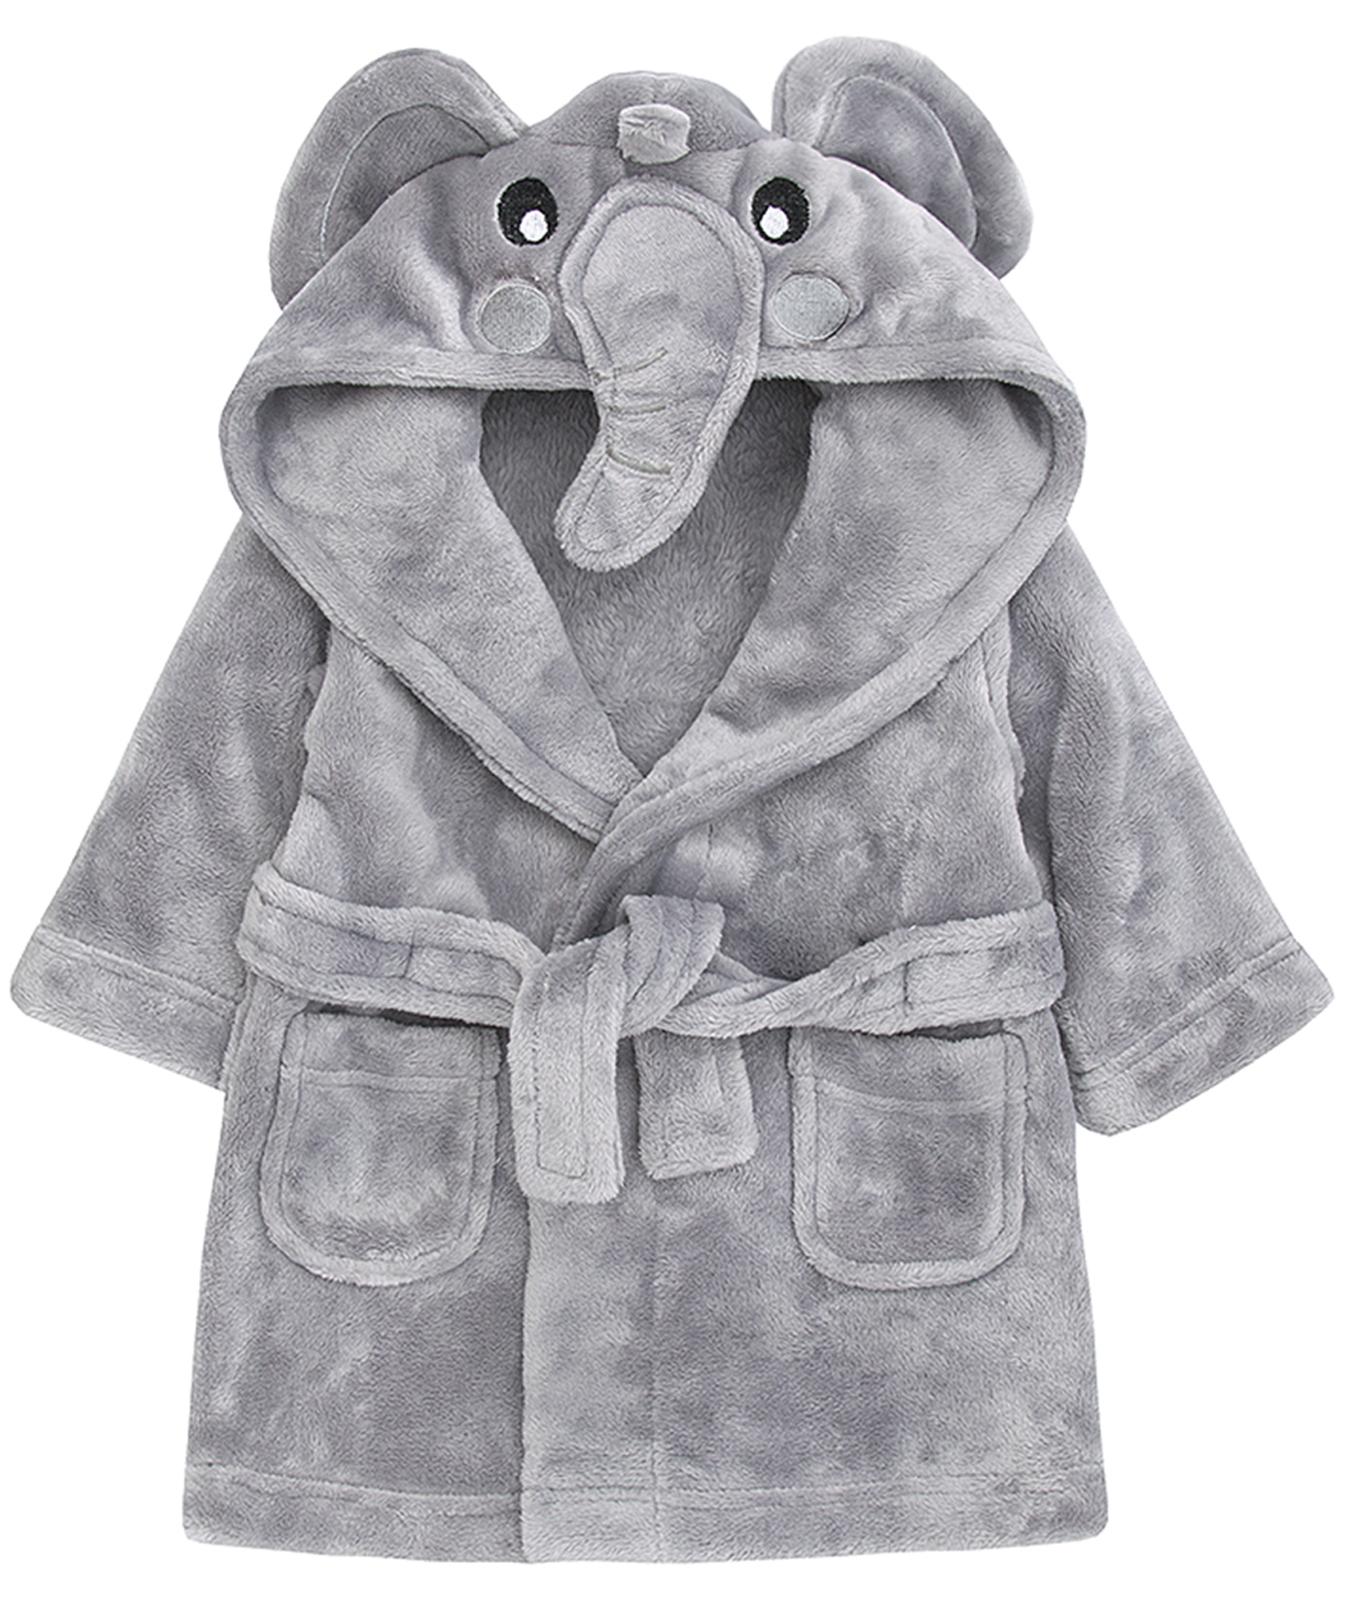 Baby Girls Boys Novelty 3D Hooded Animal Dressing Gown Bath Robe ...